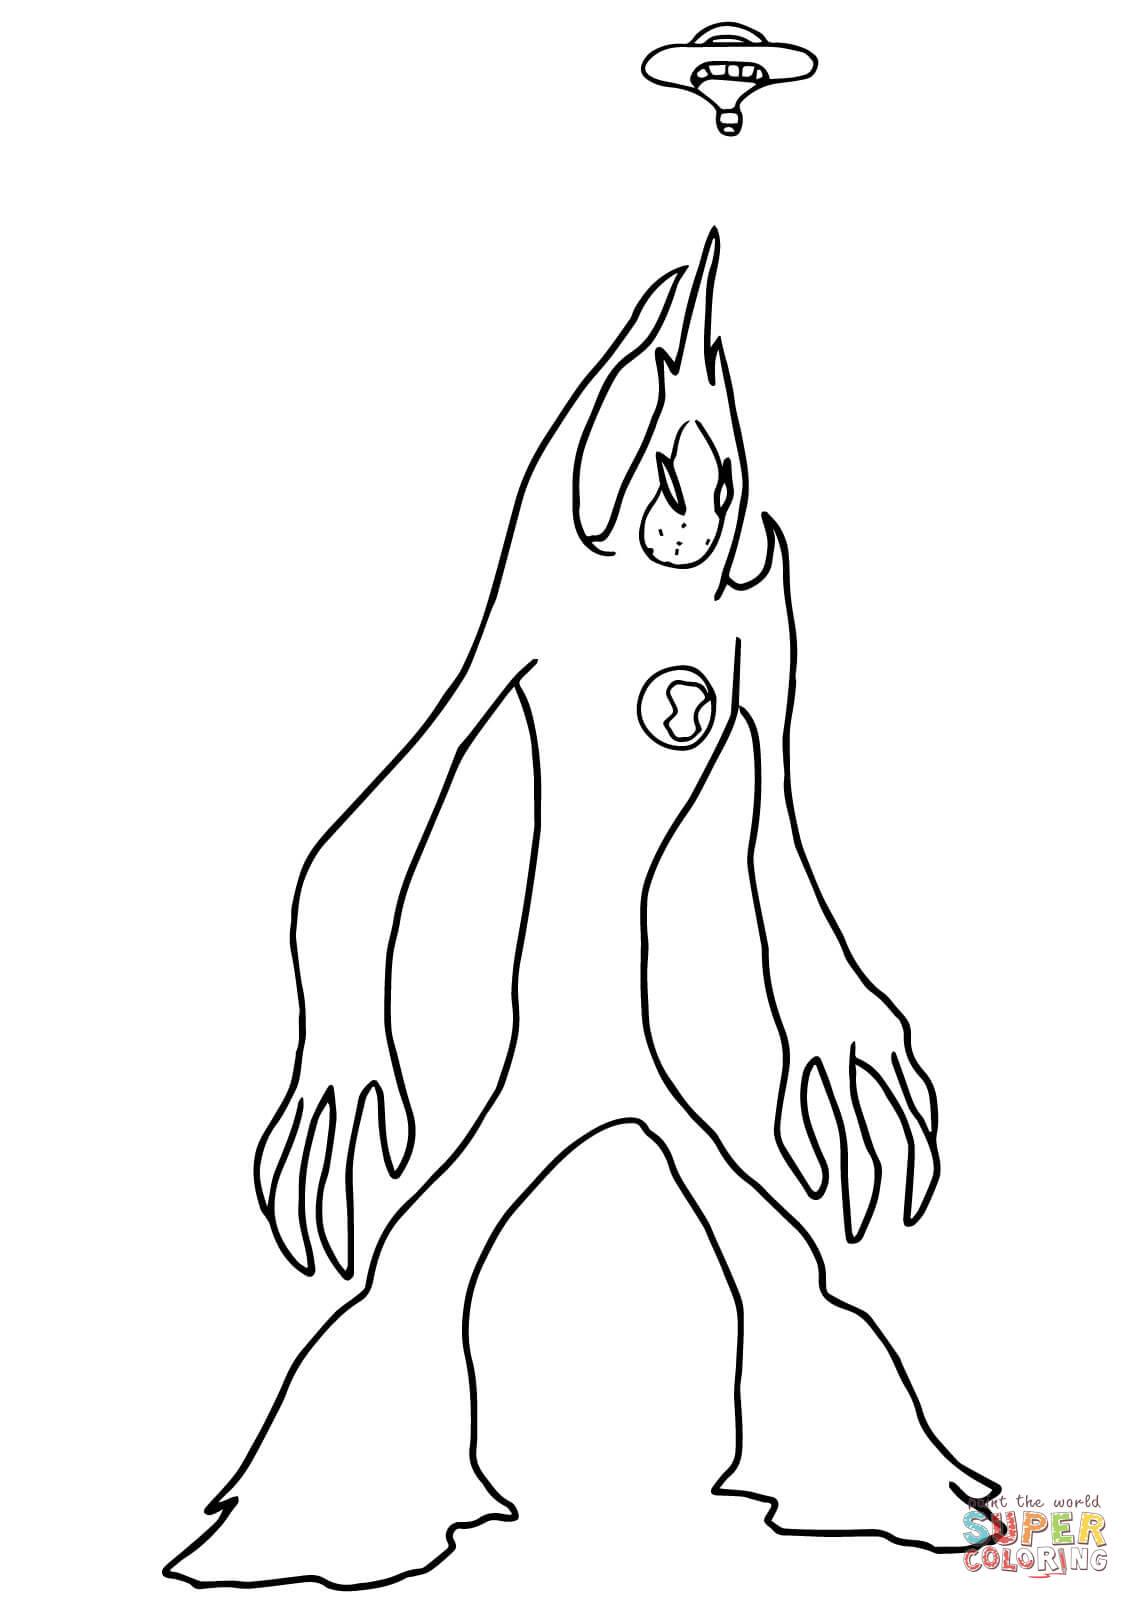 Ben 10 Alien Force Coloring Pages Swampfire